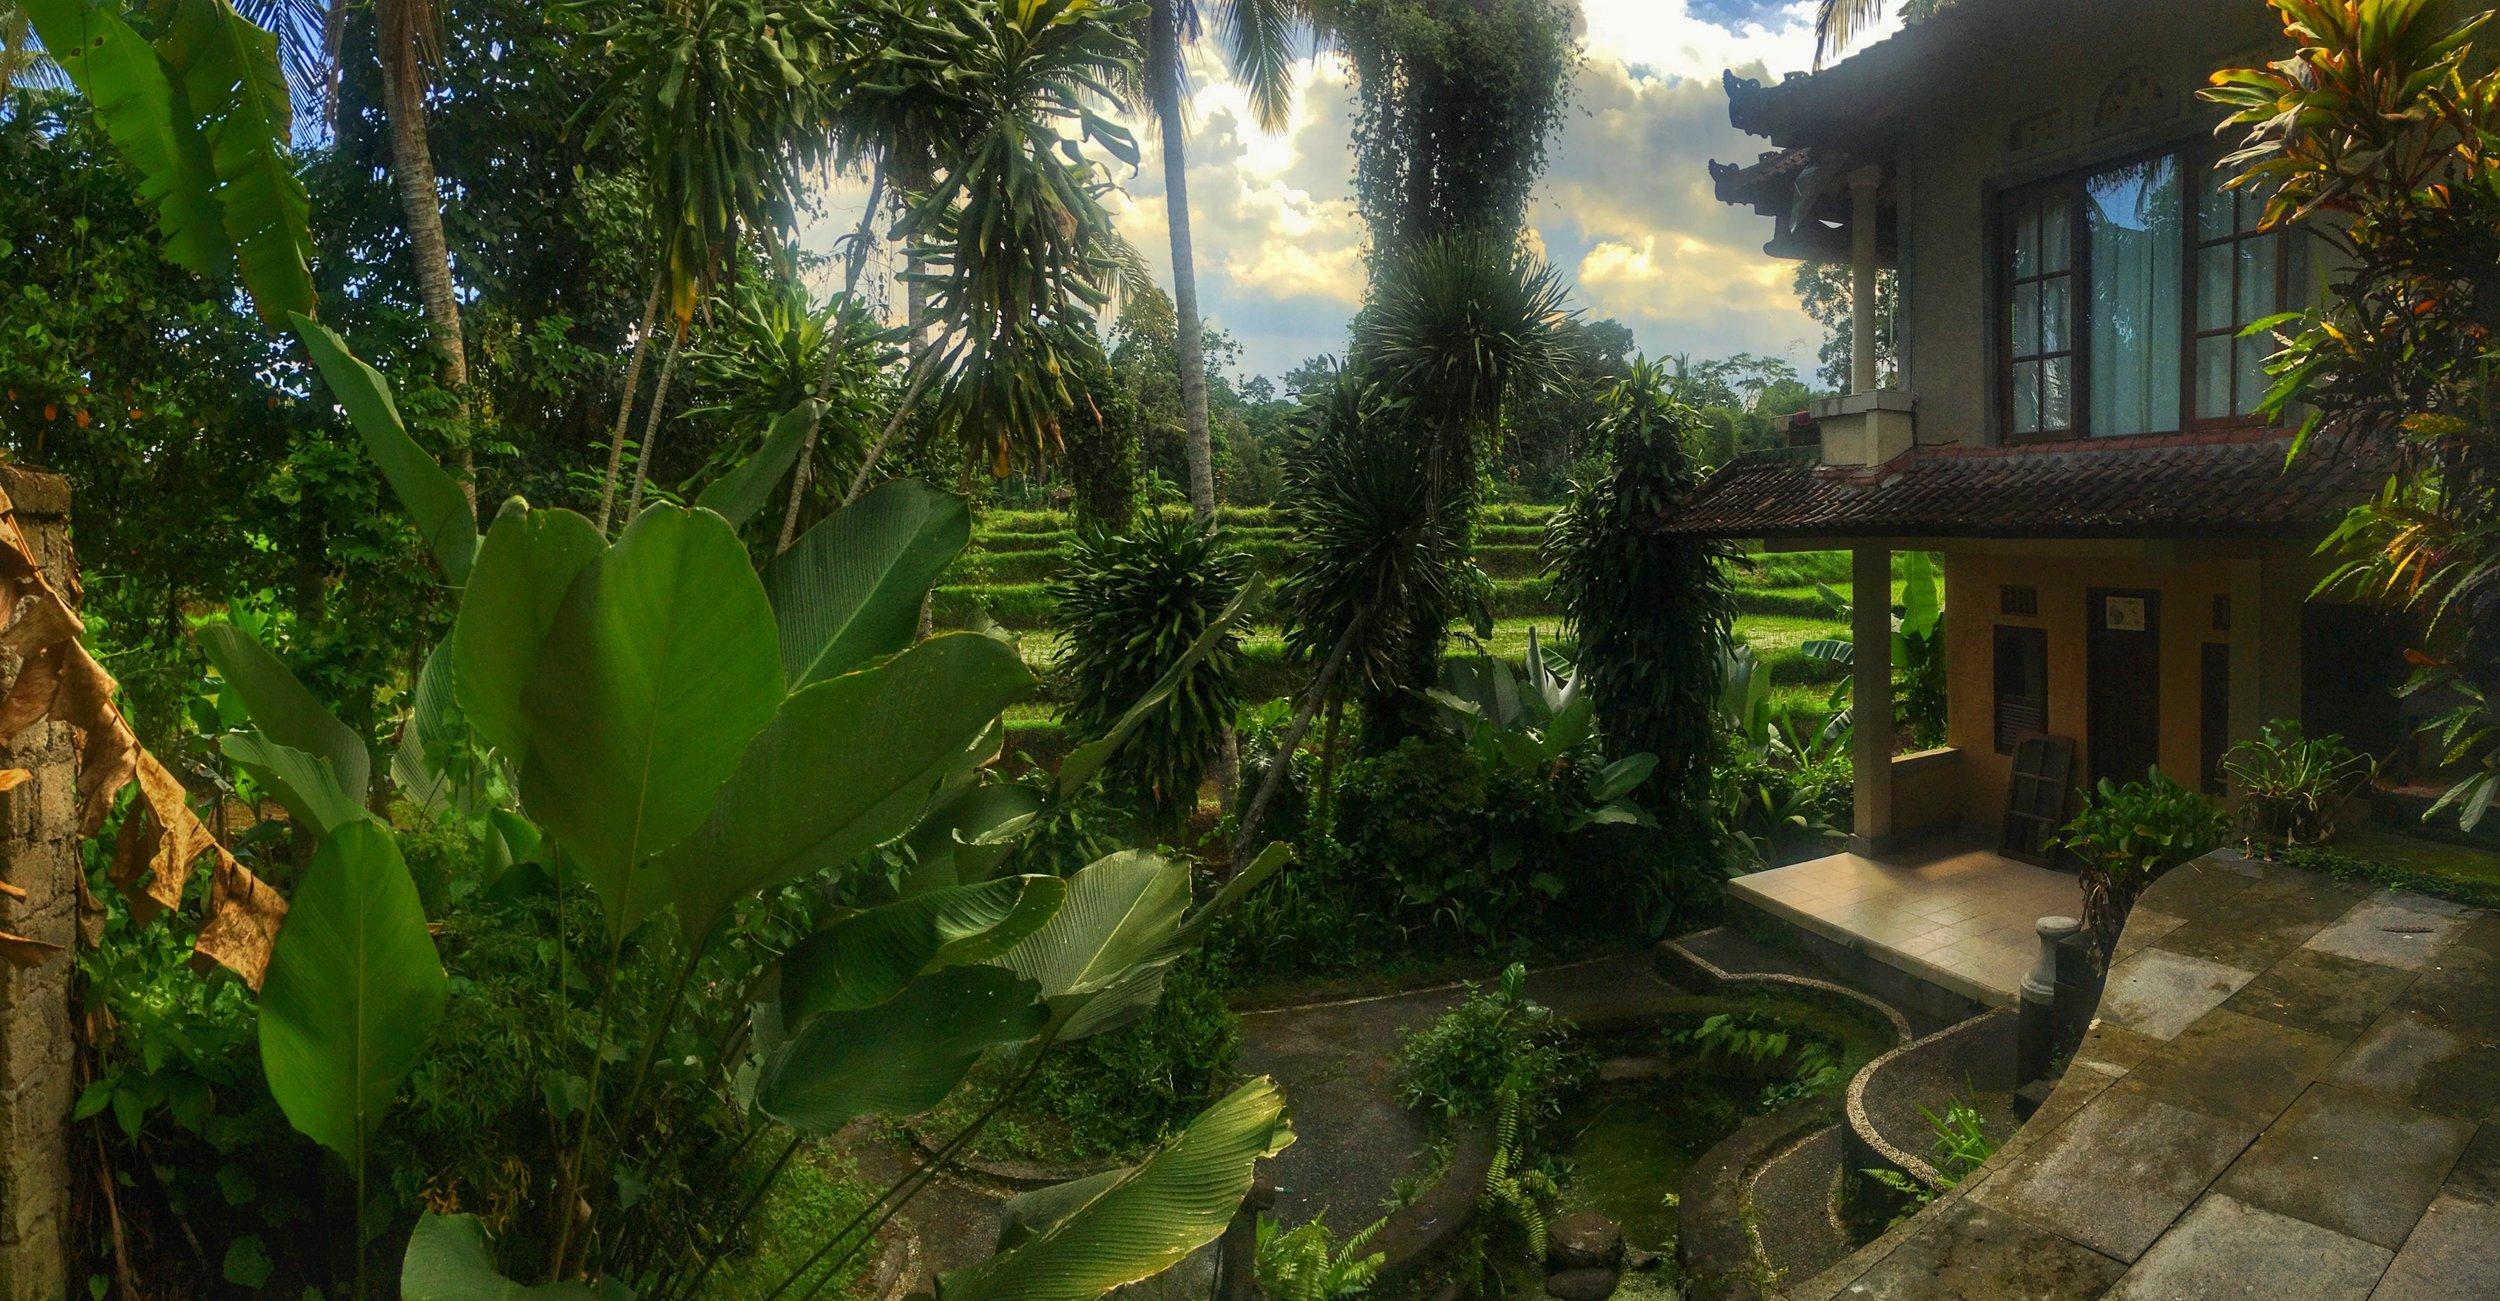 Photos from  Kubu Rama AirBnb  in Ubud, Bali, 2016.